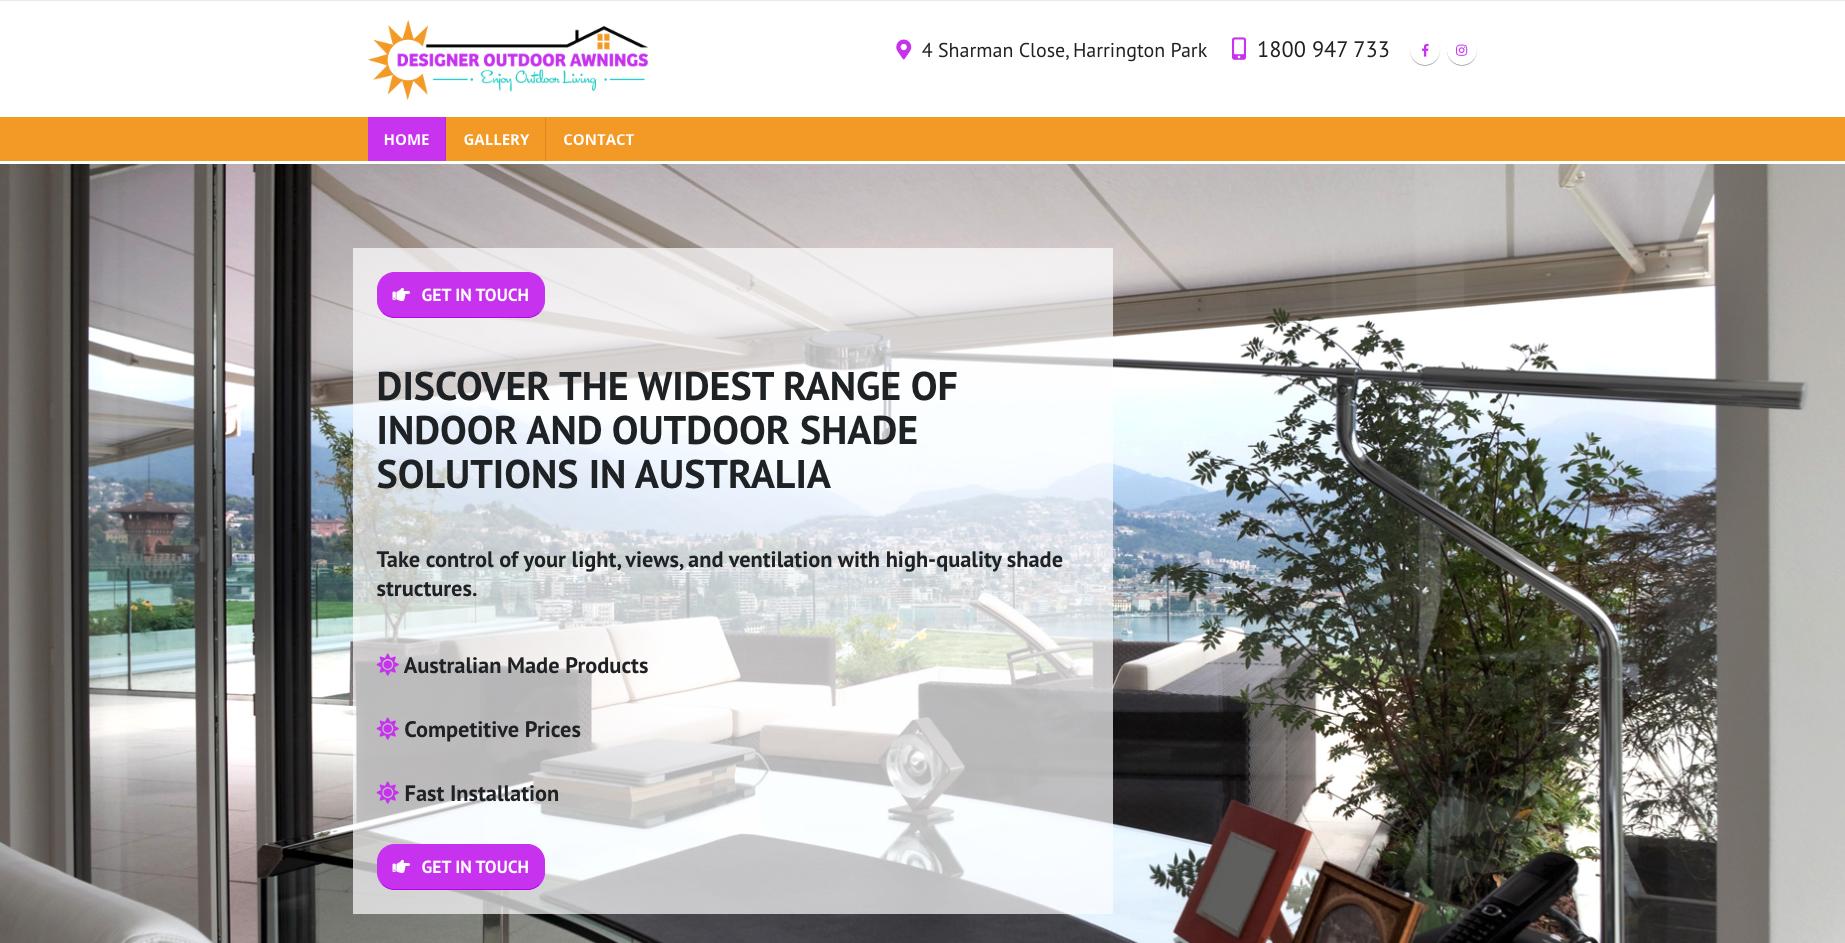 Netplanet Digital Client - Designer Outdoor Awnings